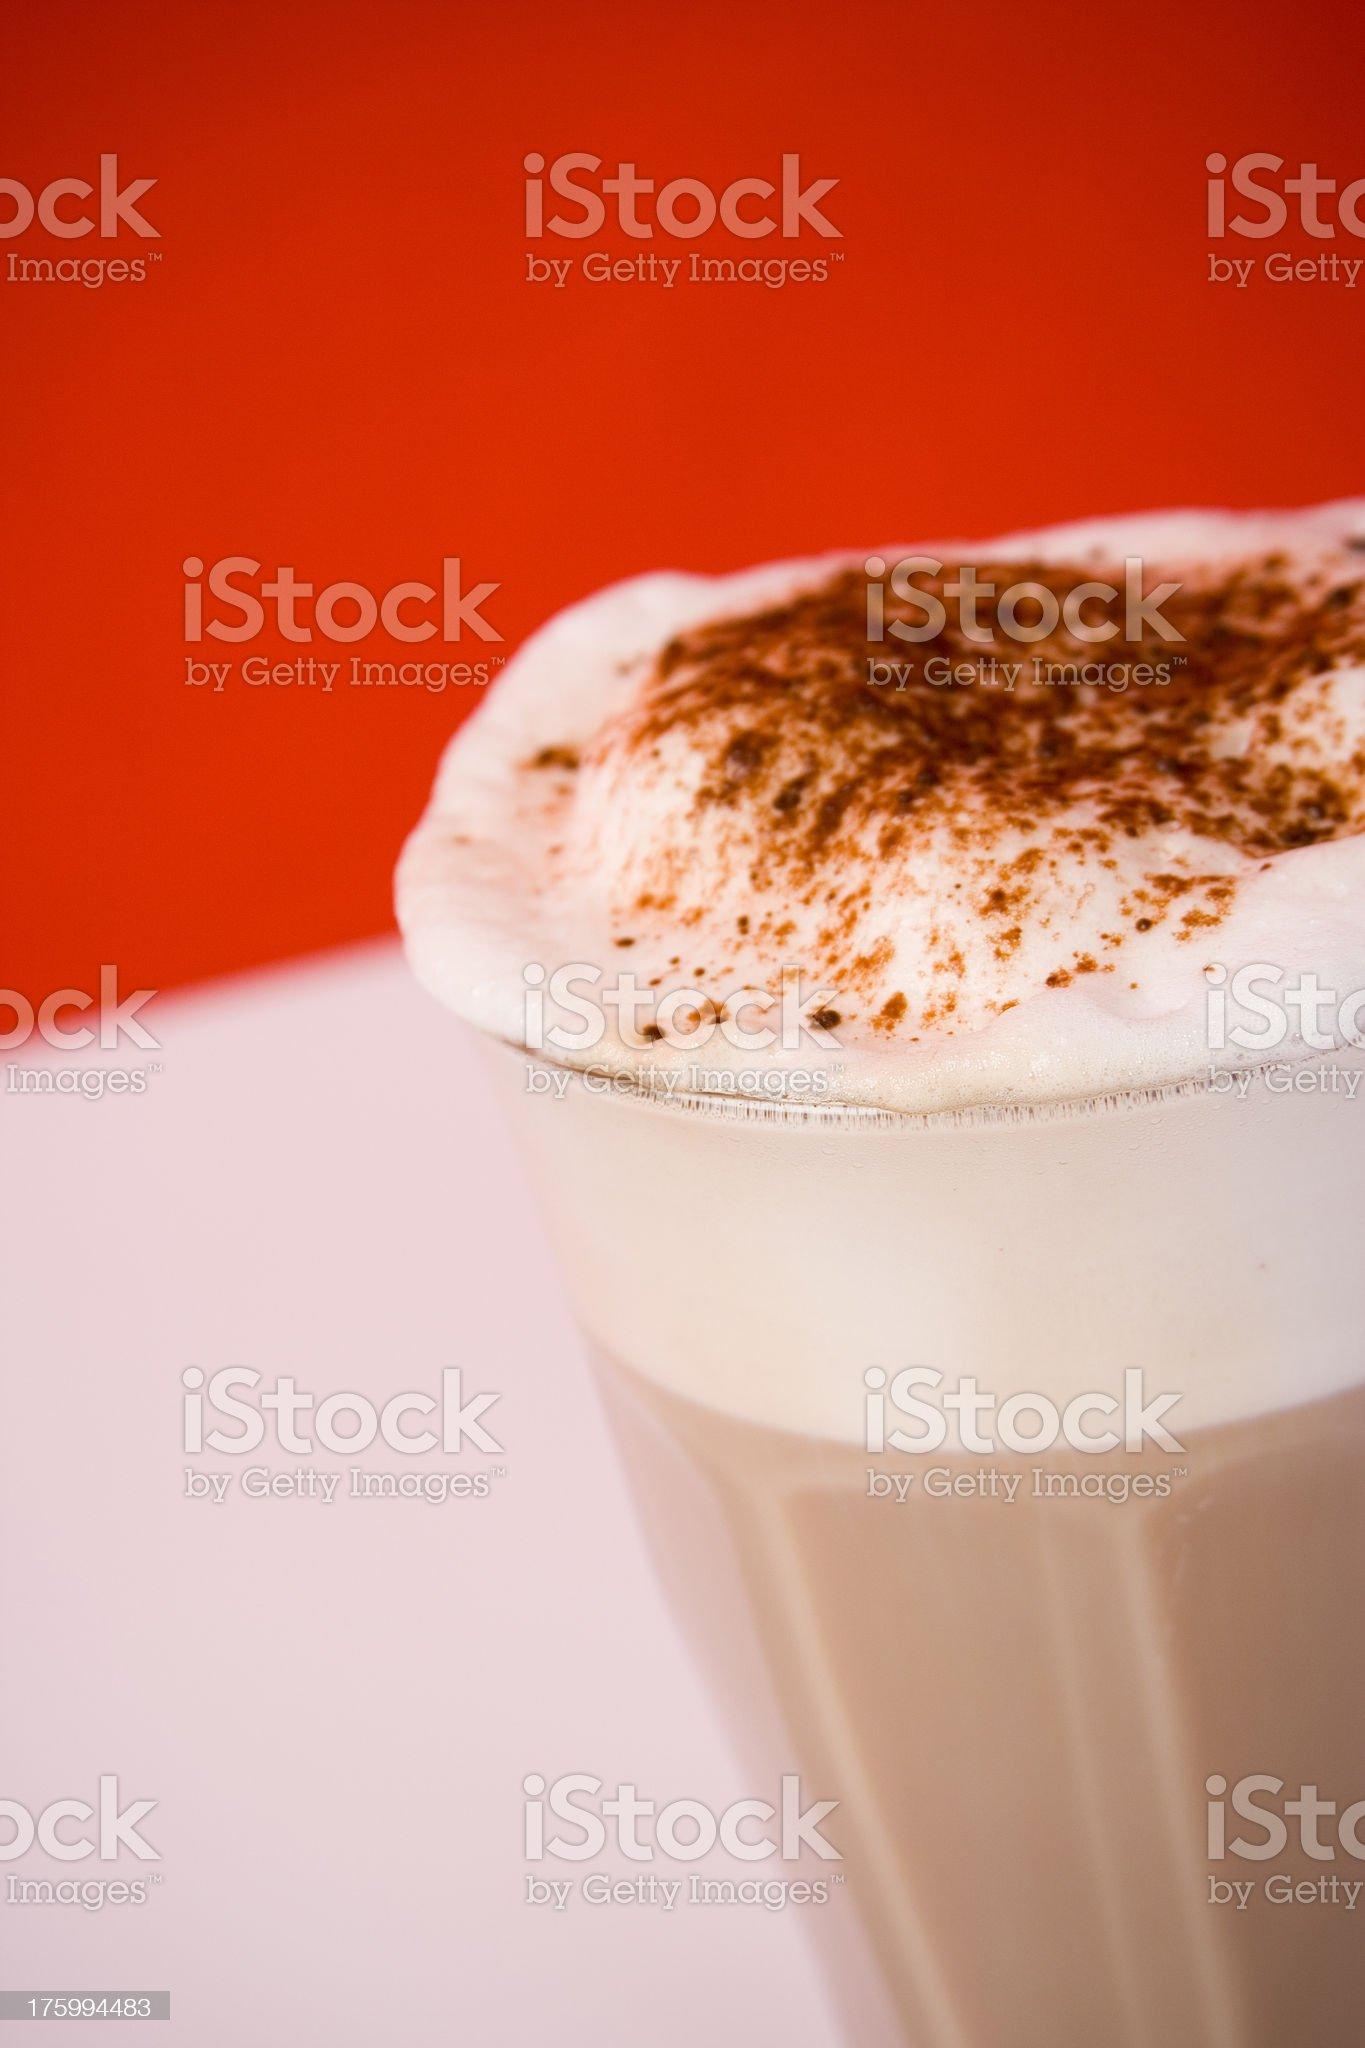 Cafe Latte Closeup royalty-free stock photo